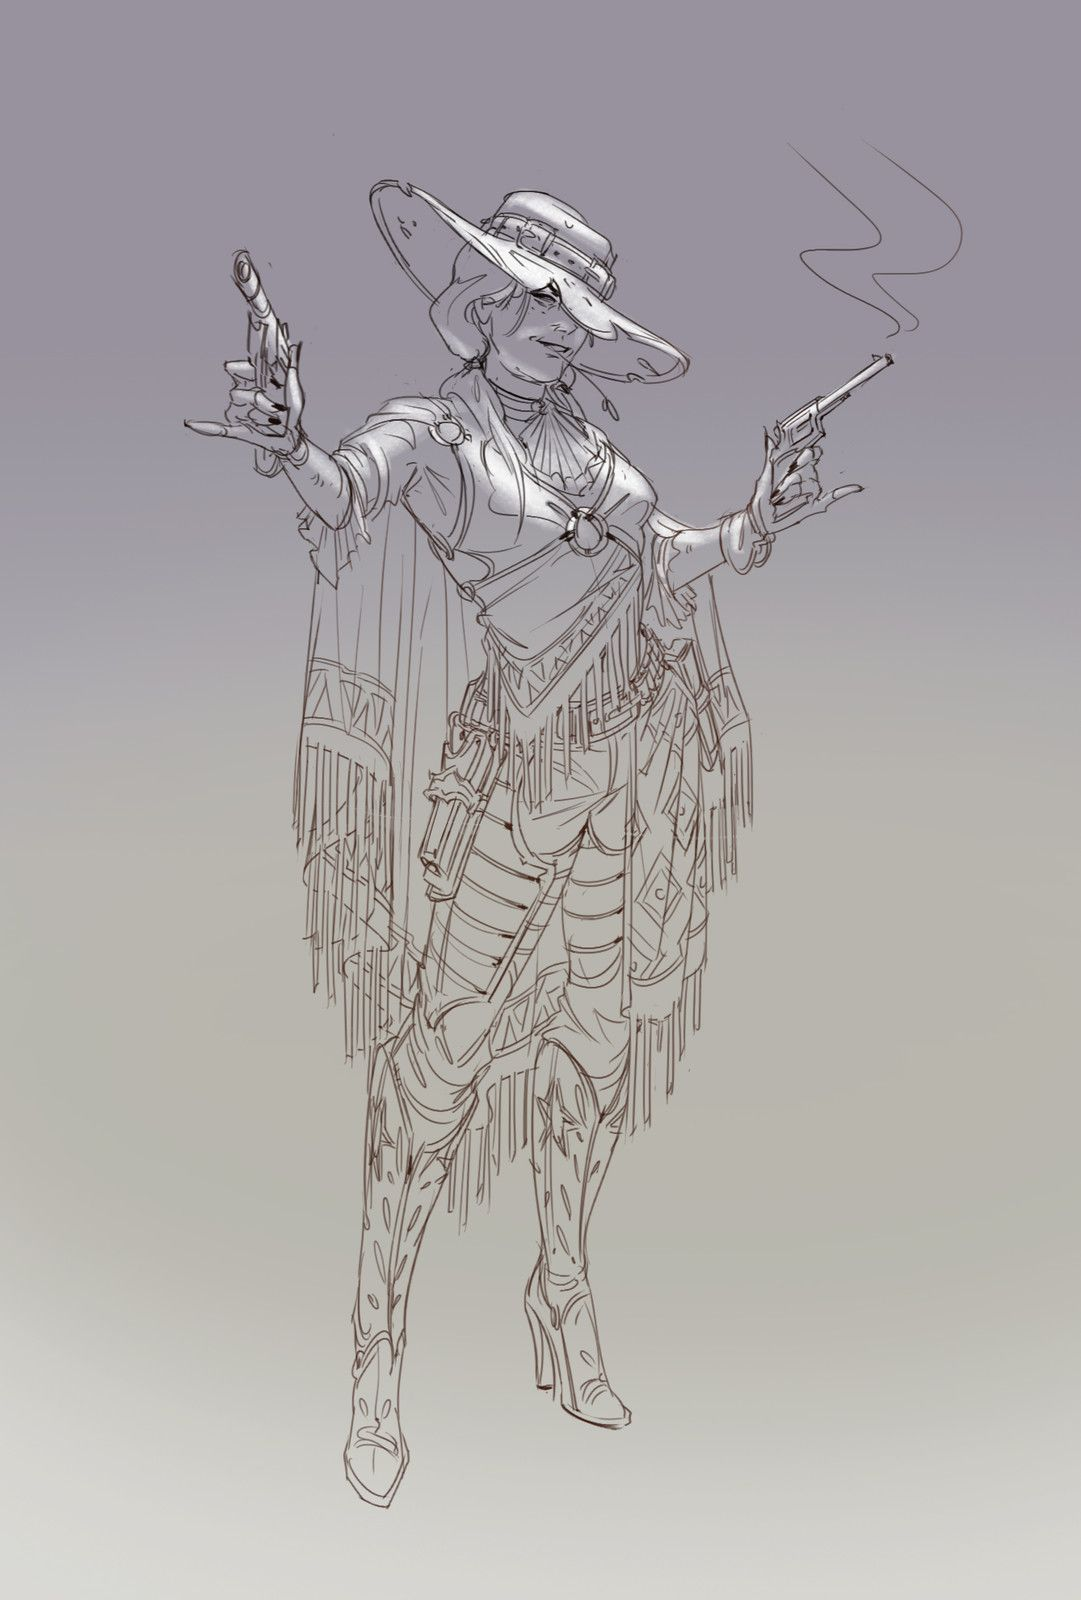 Character designs/sketches, Rembert Montald on ArtStation at https://www.artstation.com/artwork/yZVZJ